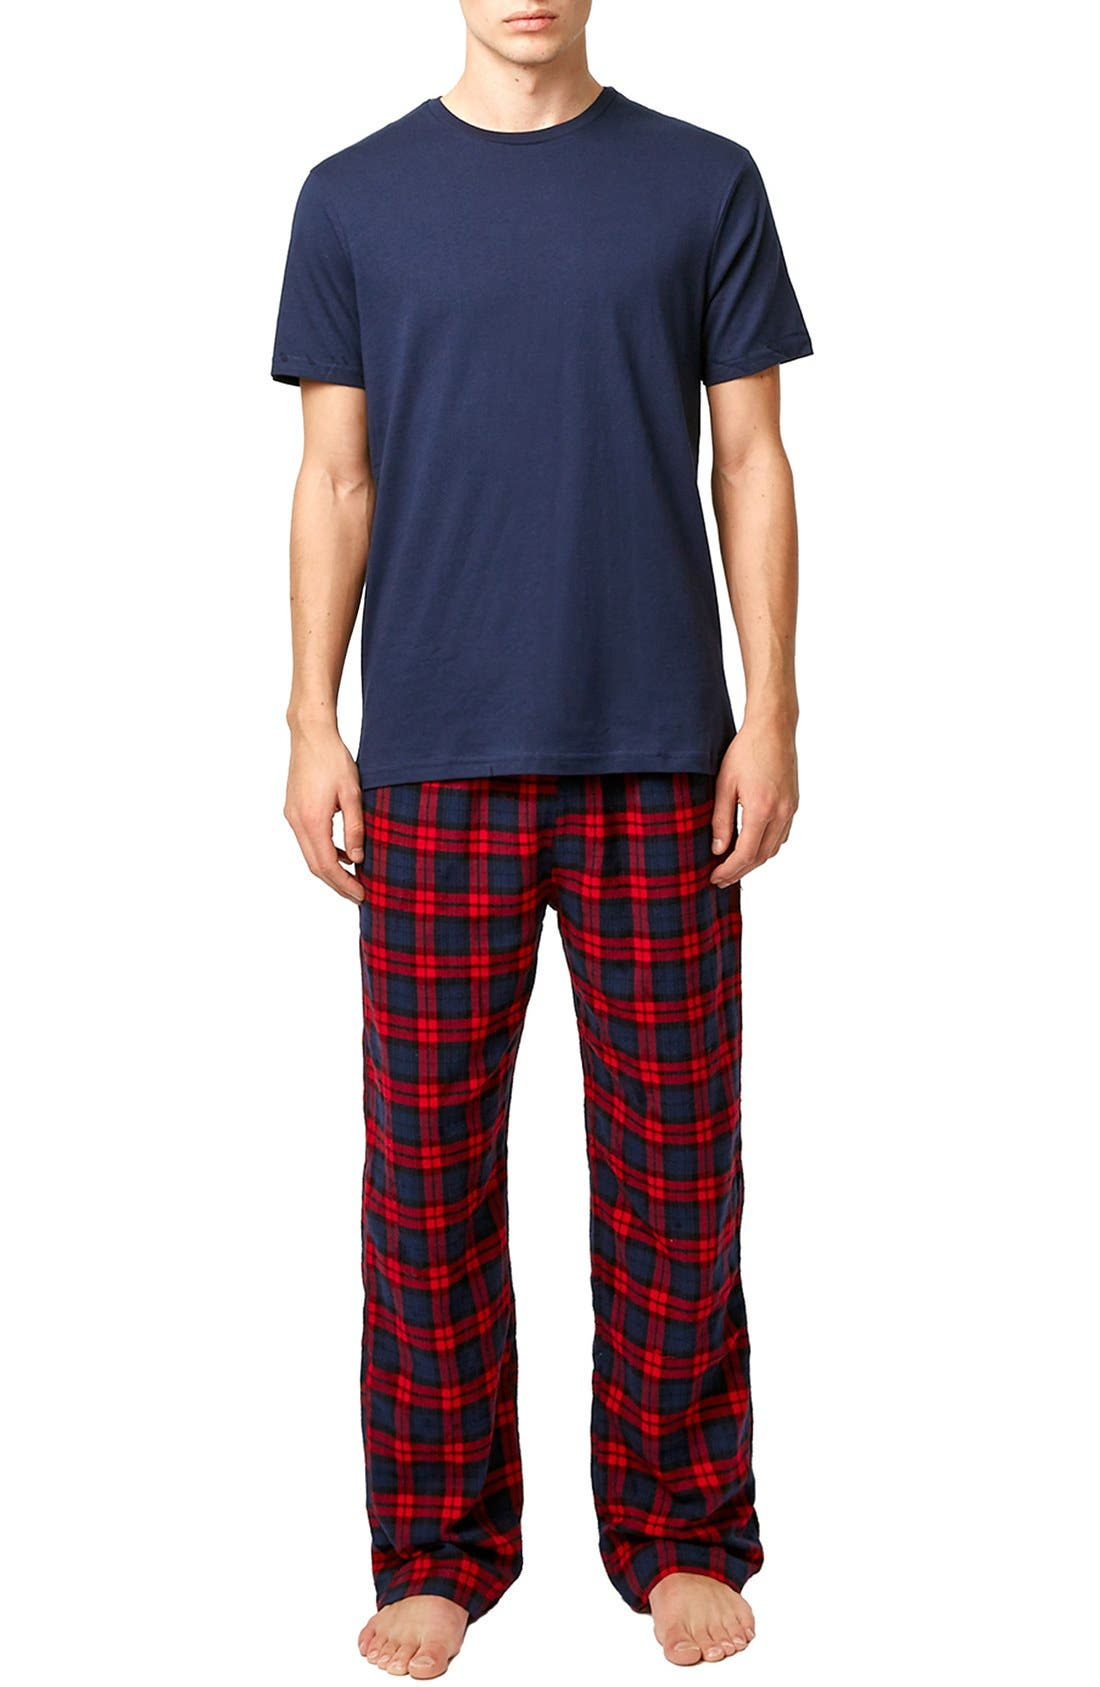 Blue & Red Pajamas,                             Main thumbnail 1, color,                             Red Multi